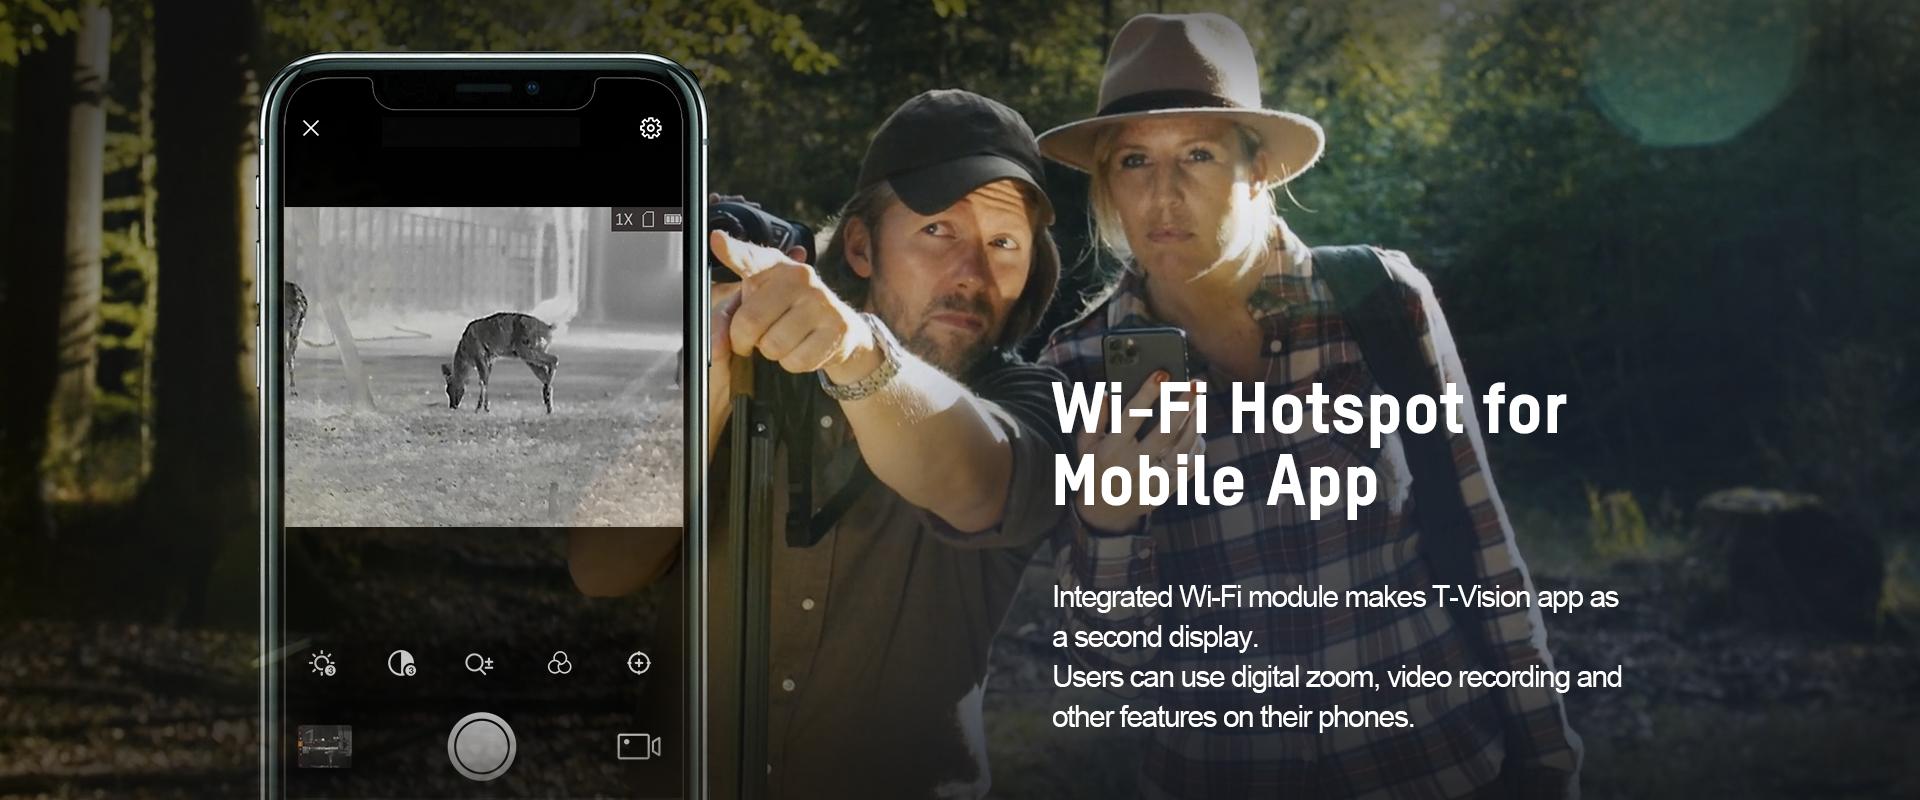 06-Wi-Fi Hotspot for T-Vision Mobile App_TS16.jpg